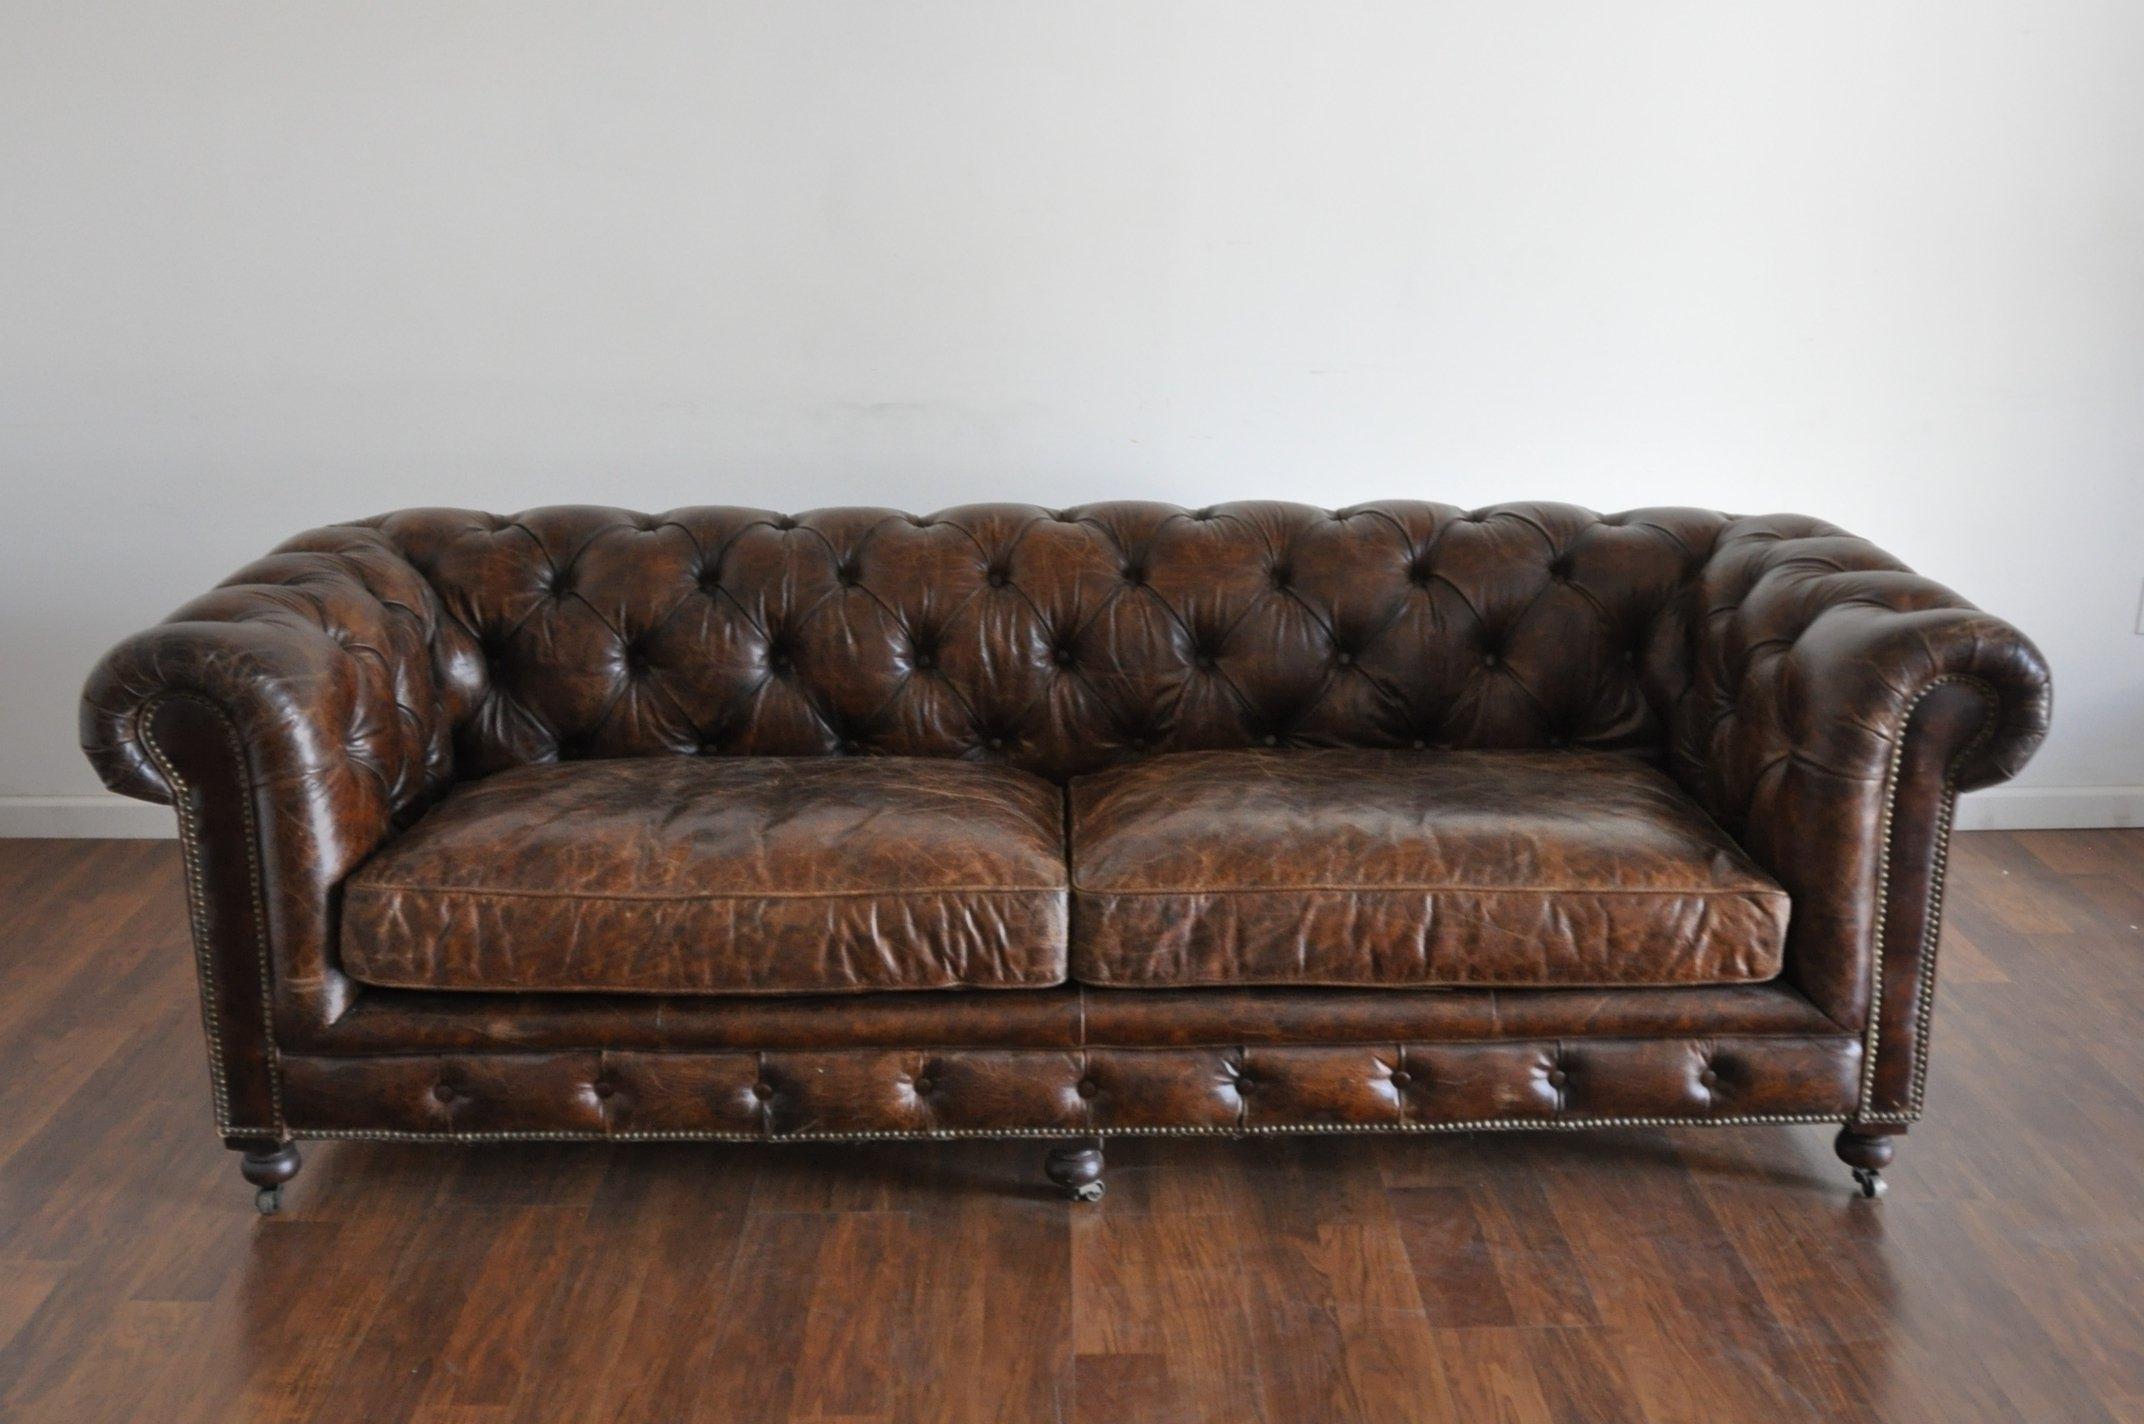 Newest Unusual Sofa Regarding Sofa : 94 Unusual Felton Tufted Sofa Image Ideas Felton Tufted (View 8 of 20)